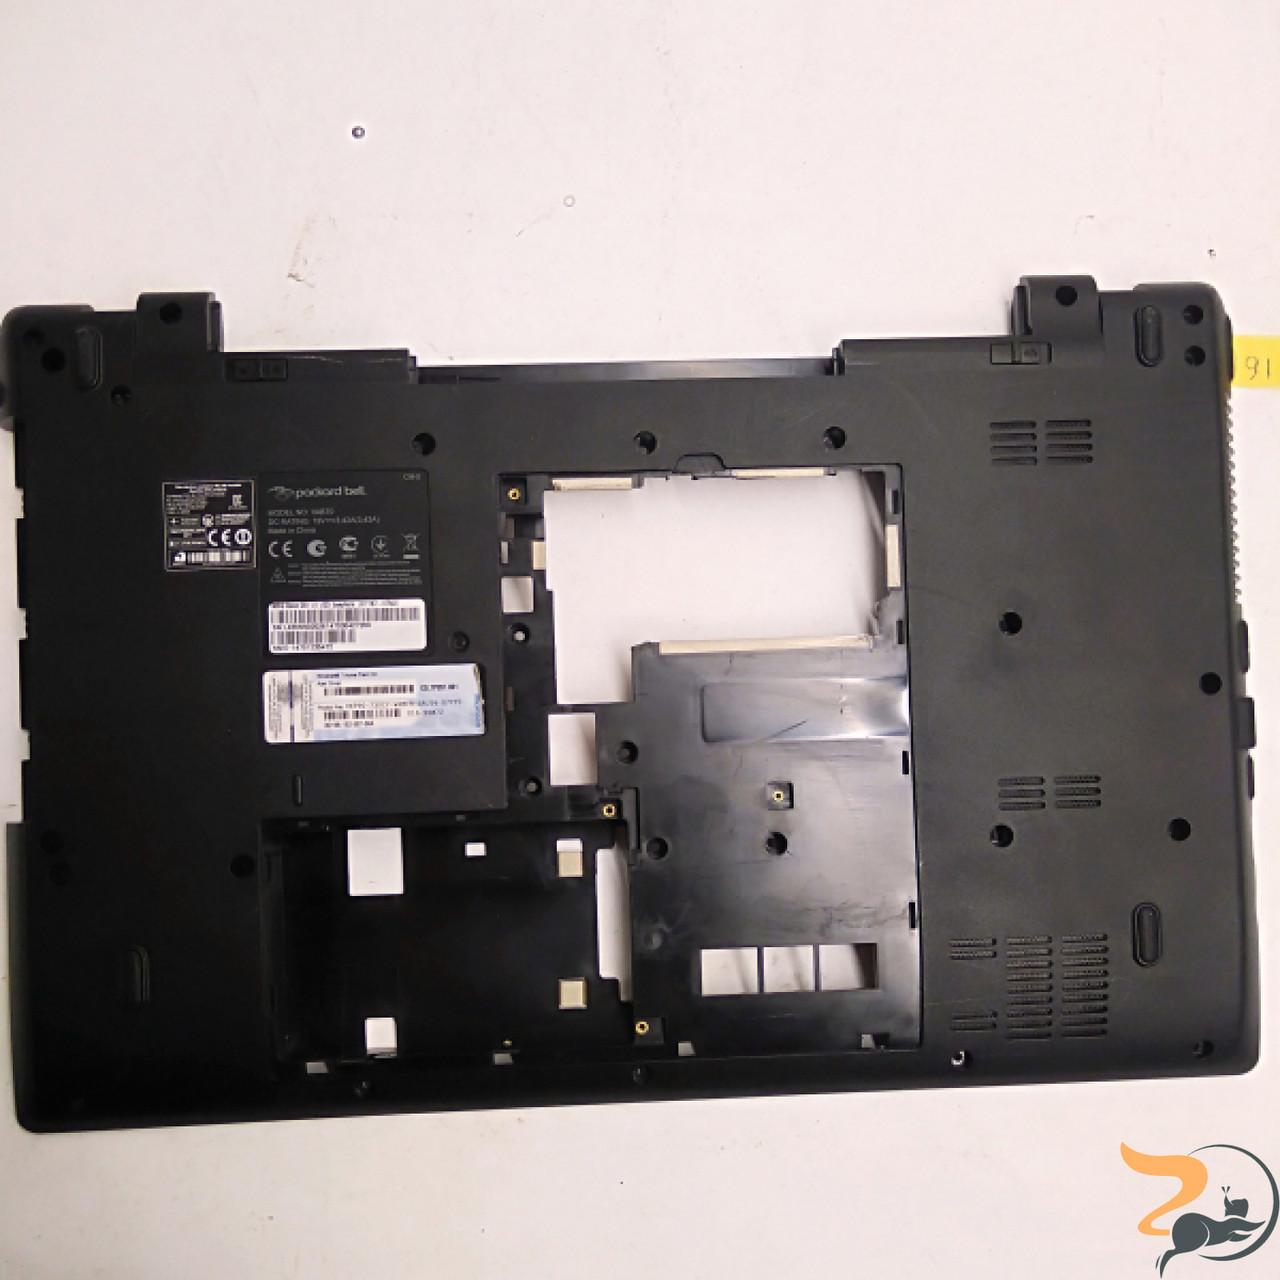 Нижня частина корпуса для ноутбука Acer Packard Bell VAB70, 13no-yqa0211, Б/В